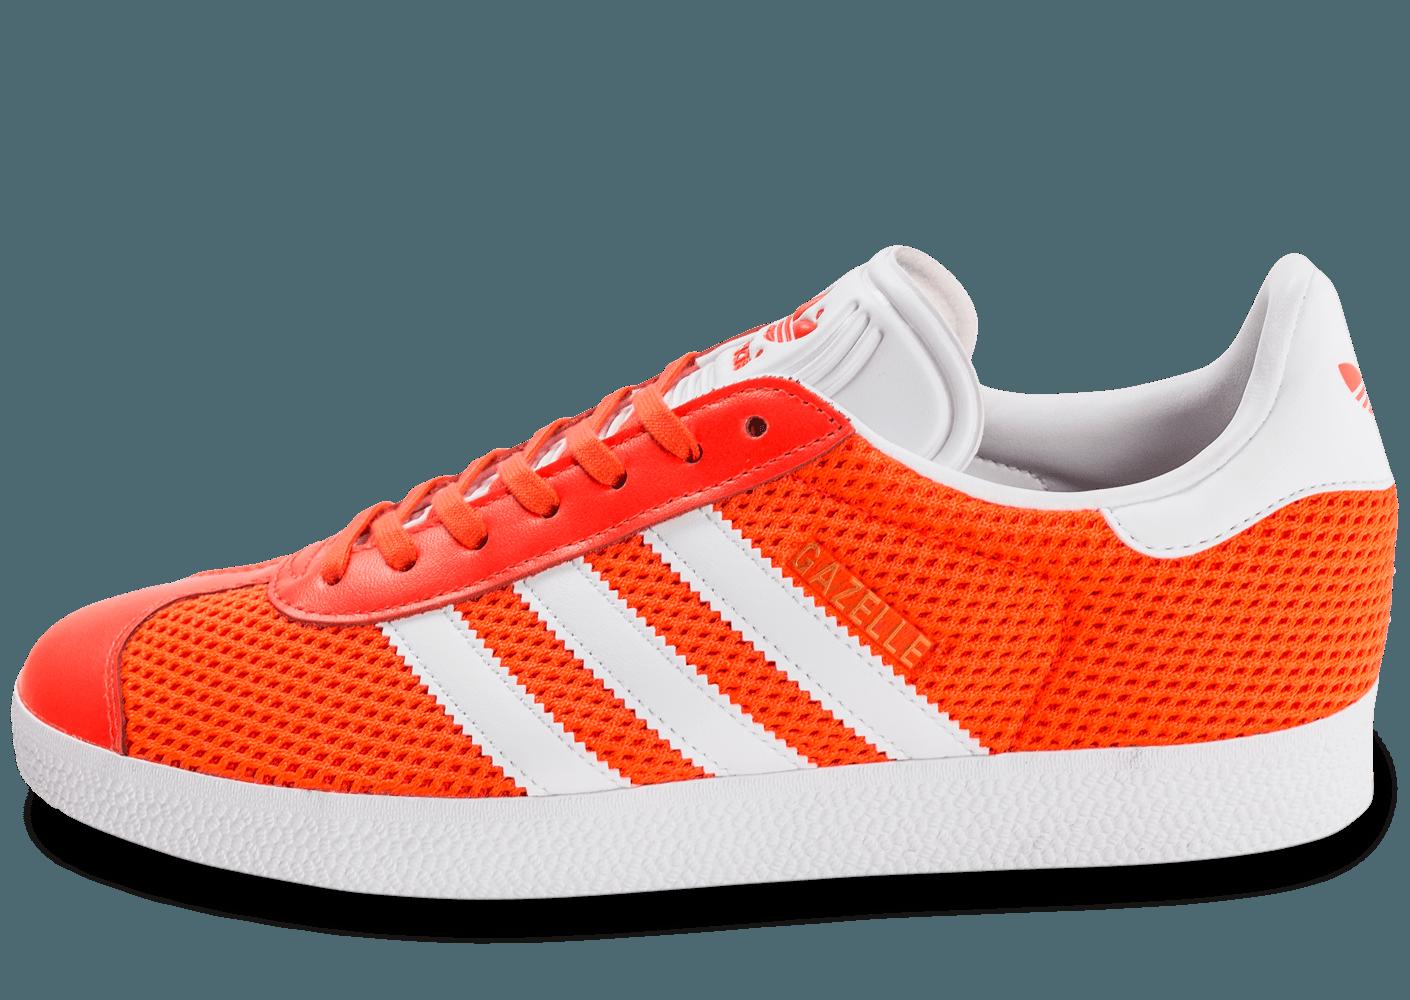 Gros Orange Pas Commulangues Basket Fluo Vente Cher be Adidas En SpqVGzMU